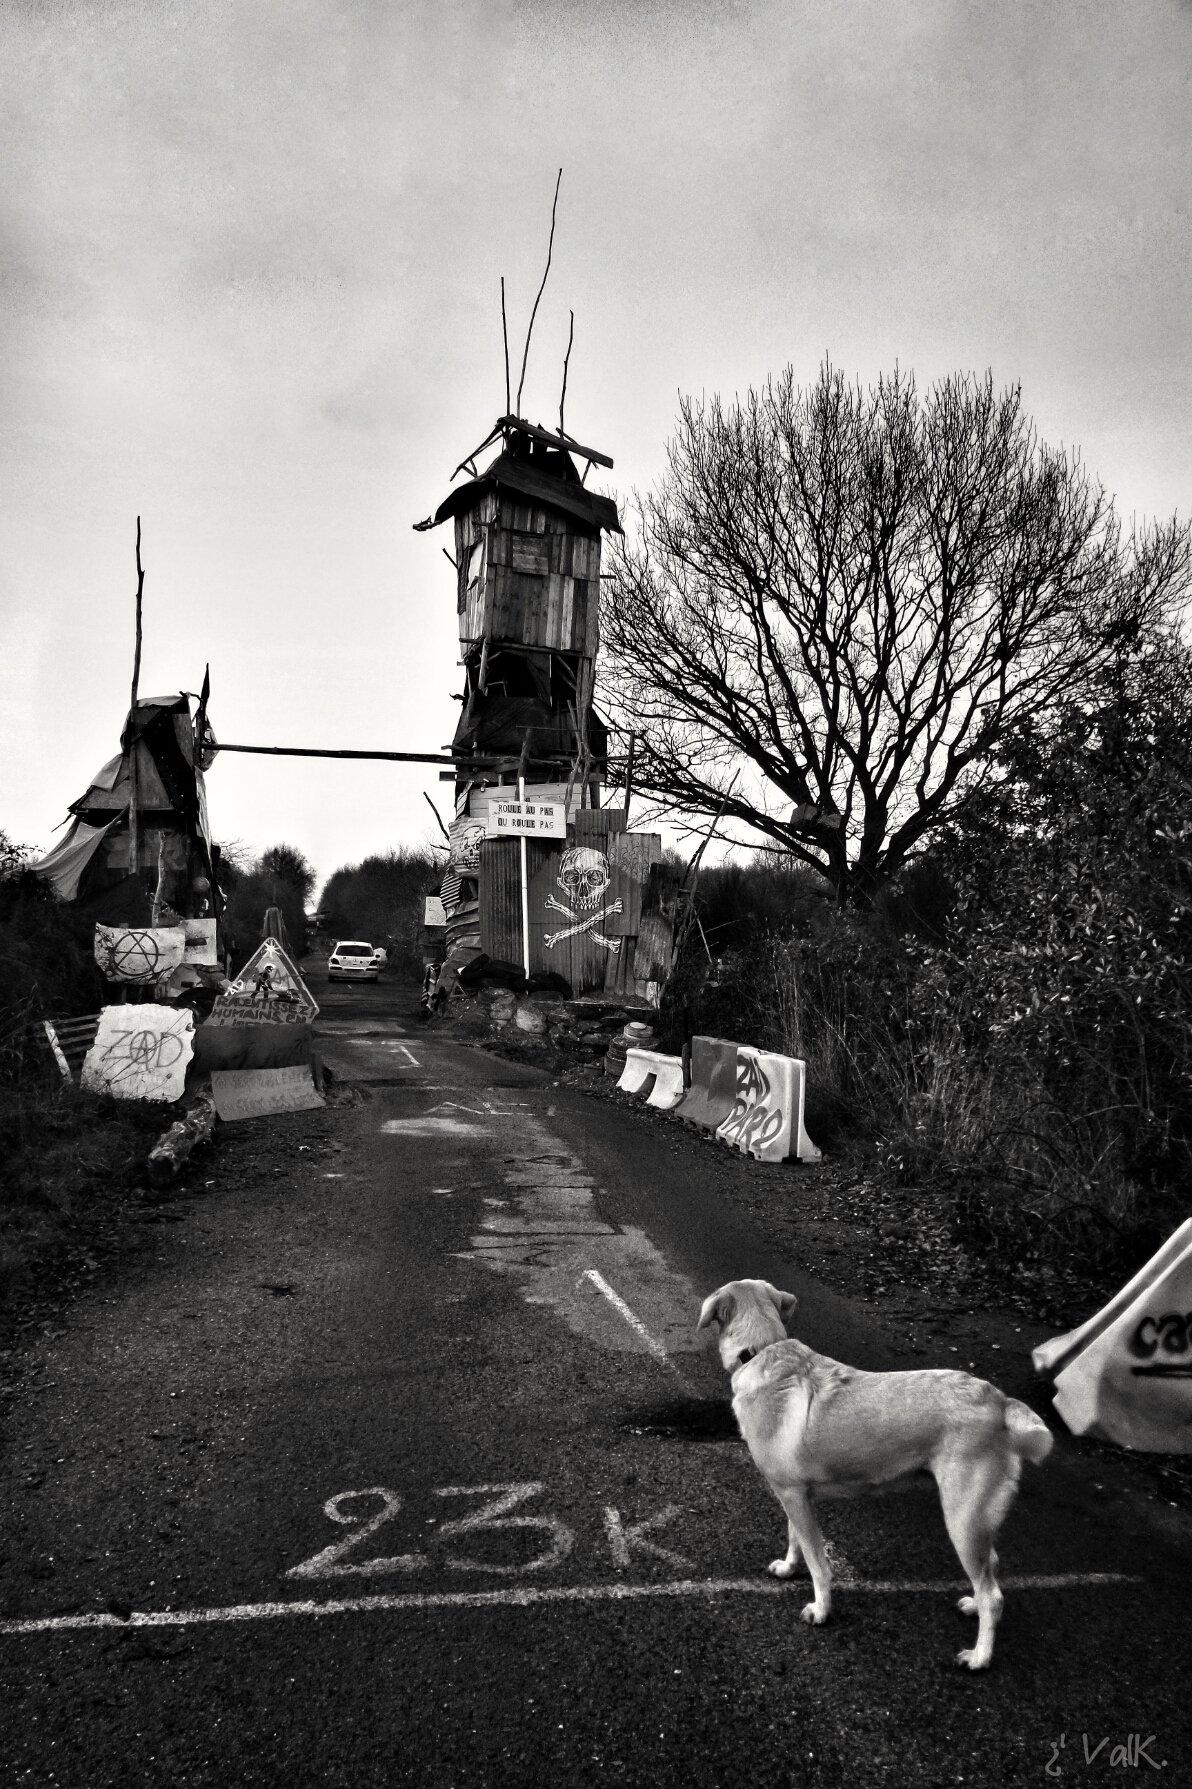 La torre-barricata Bison Futé, 2016. Foto di Valk